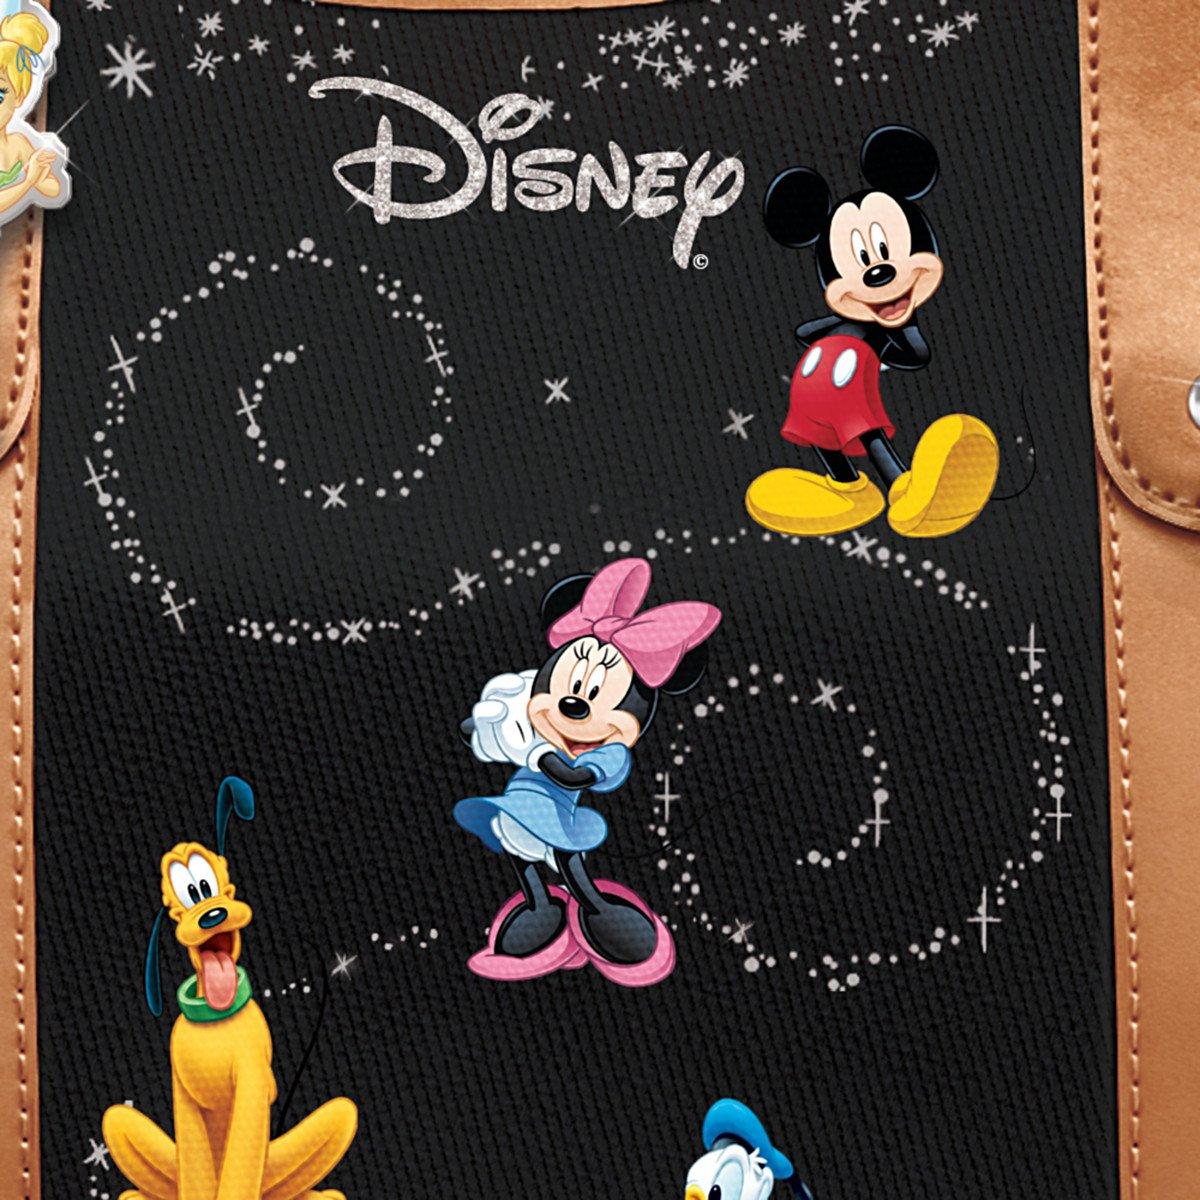 The Bradford Exchange Disney Handbag With Character Art And Tinker Bell Charm 01-23435-001